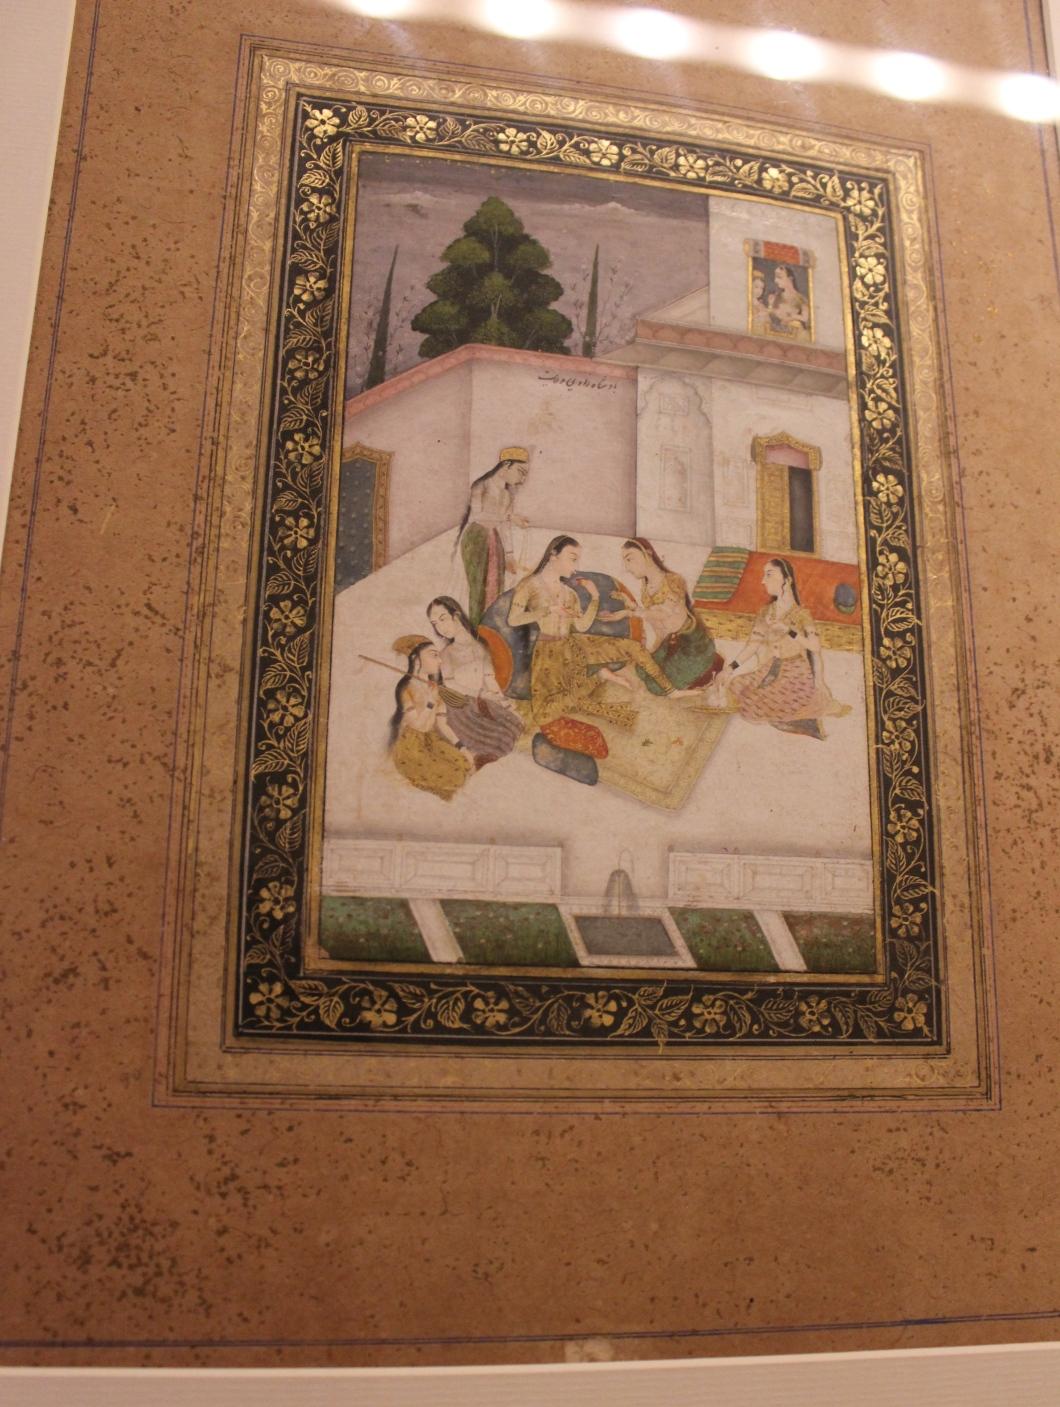 Princess Enjoying a Pleasure Party: Rajasthani, Bikaner, Early 18th century CE, Sir Ratan Tata Art Collection (Indian Miniature Painting - Photograph in mirandavoice.com)